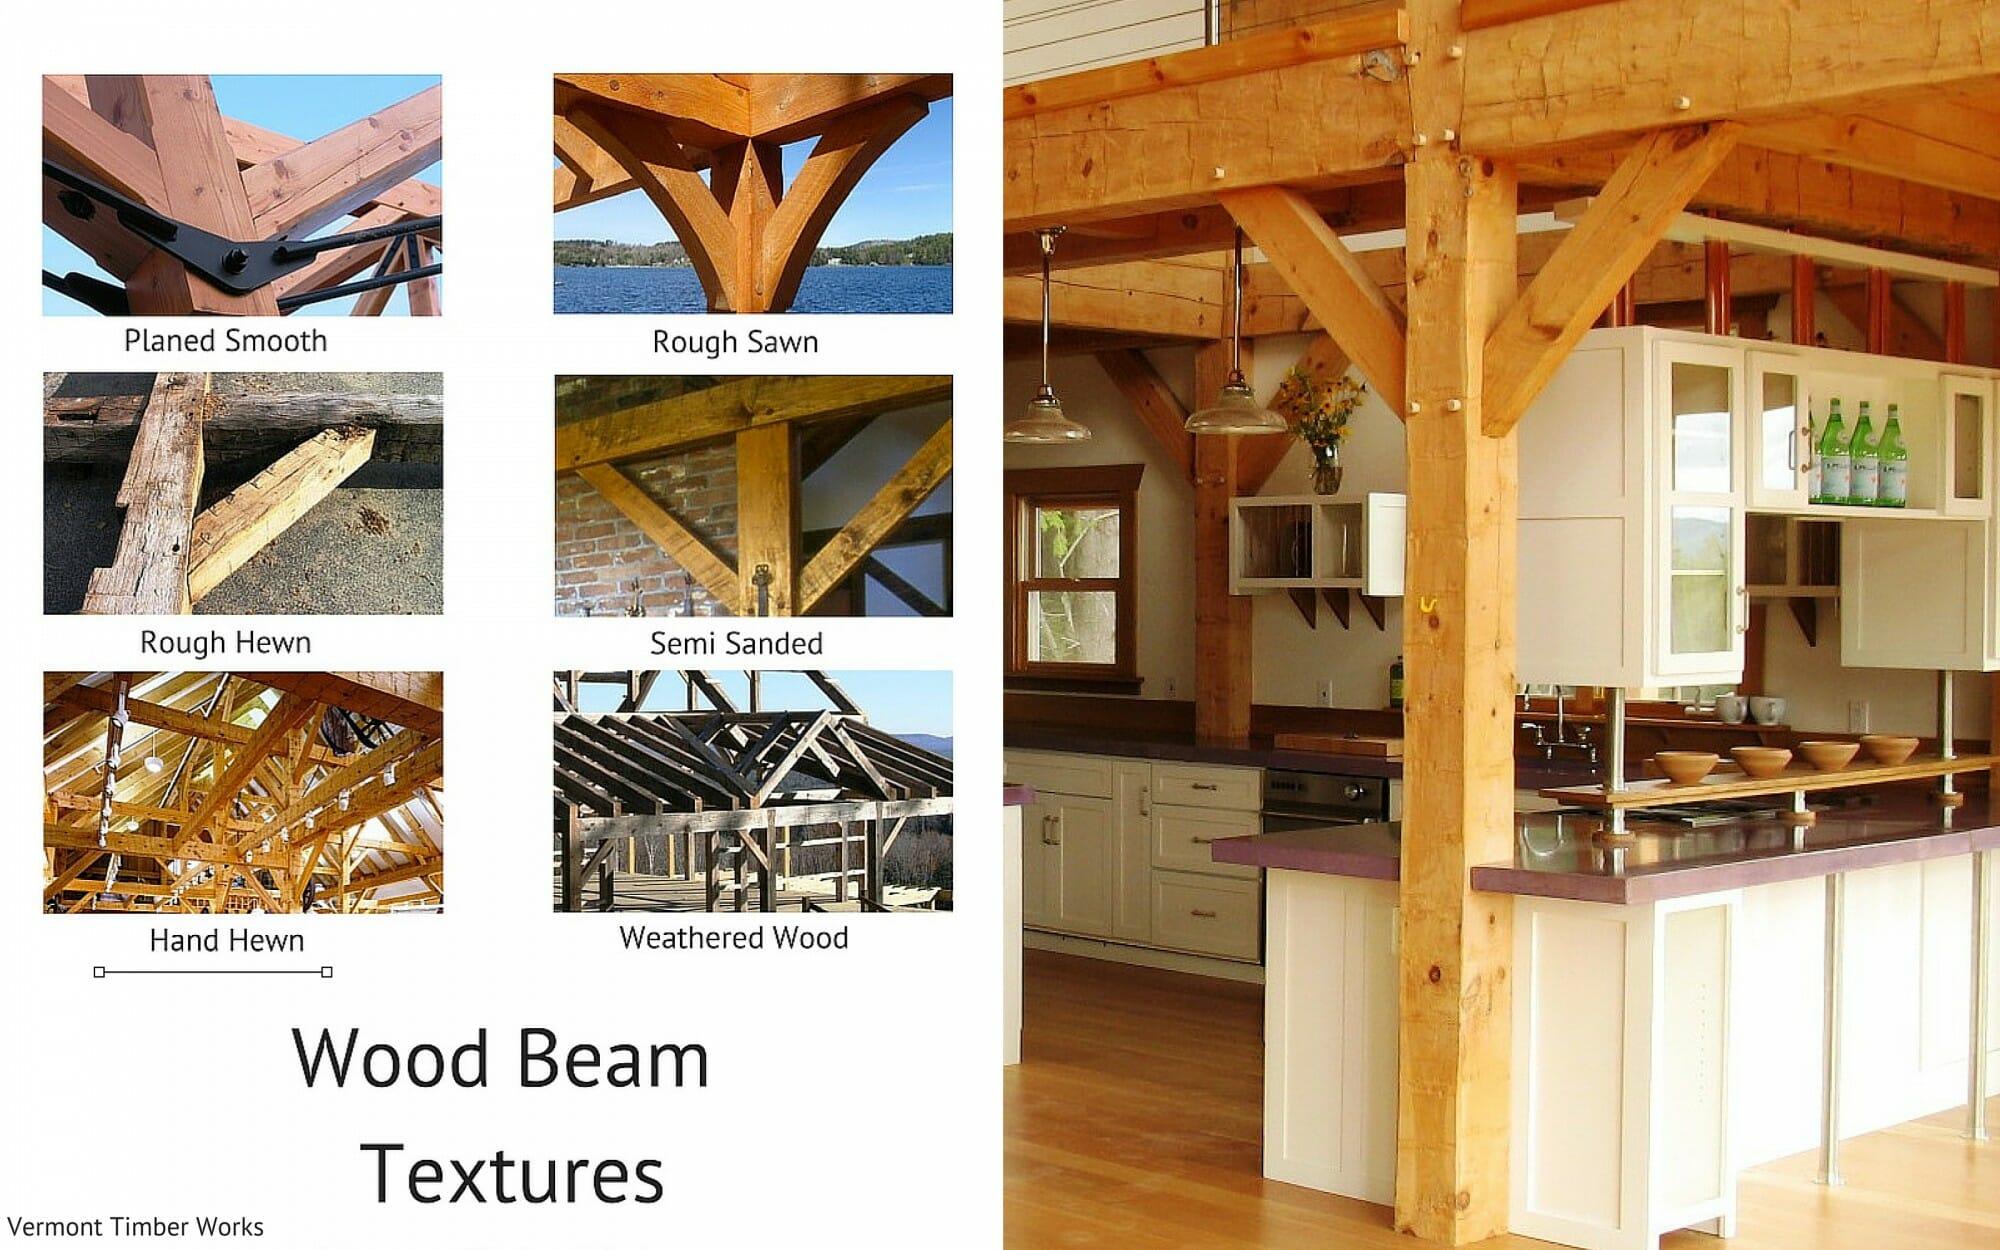 Wood Beam Textures Hand Hewn Gambrel Barn